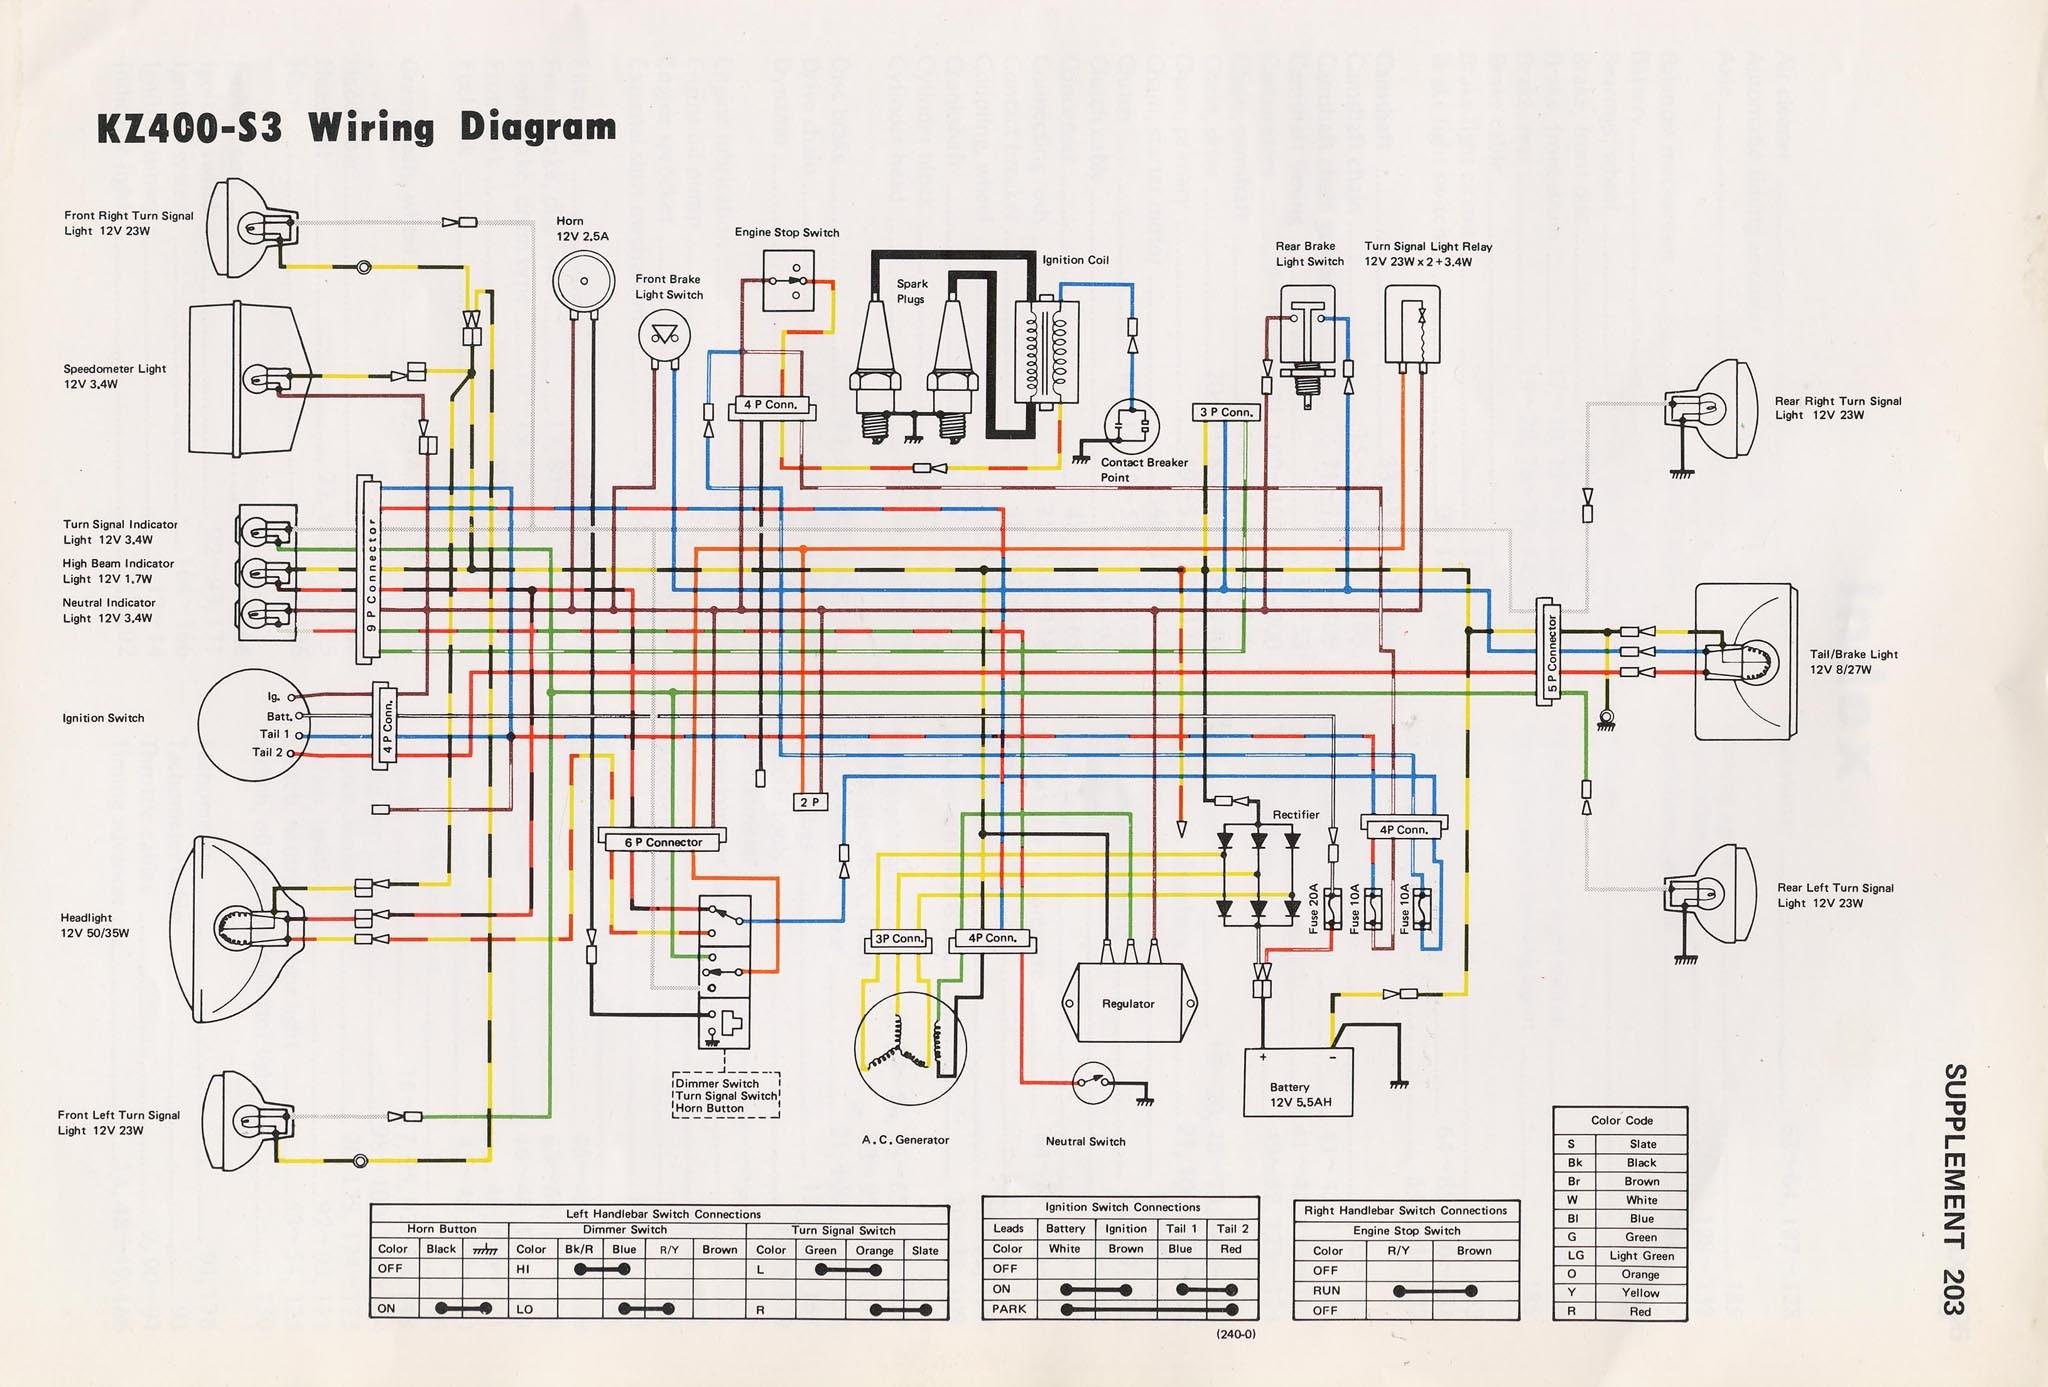 Superb Wrg 9867 Z400 Wiring Diagram Wiring Cloud Staixaidewilluminateatxorg